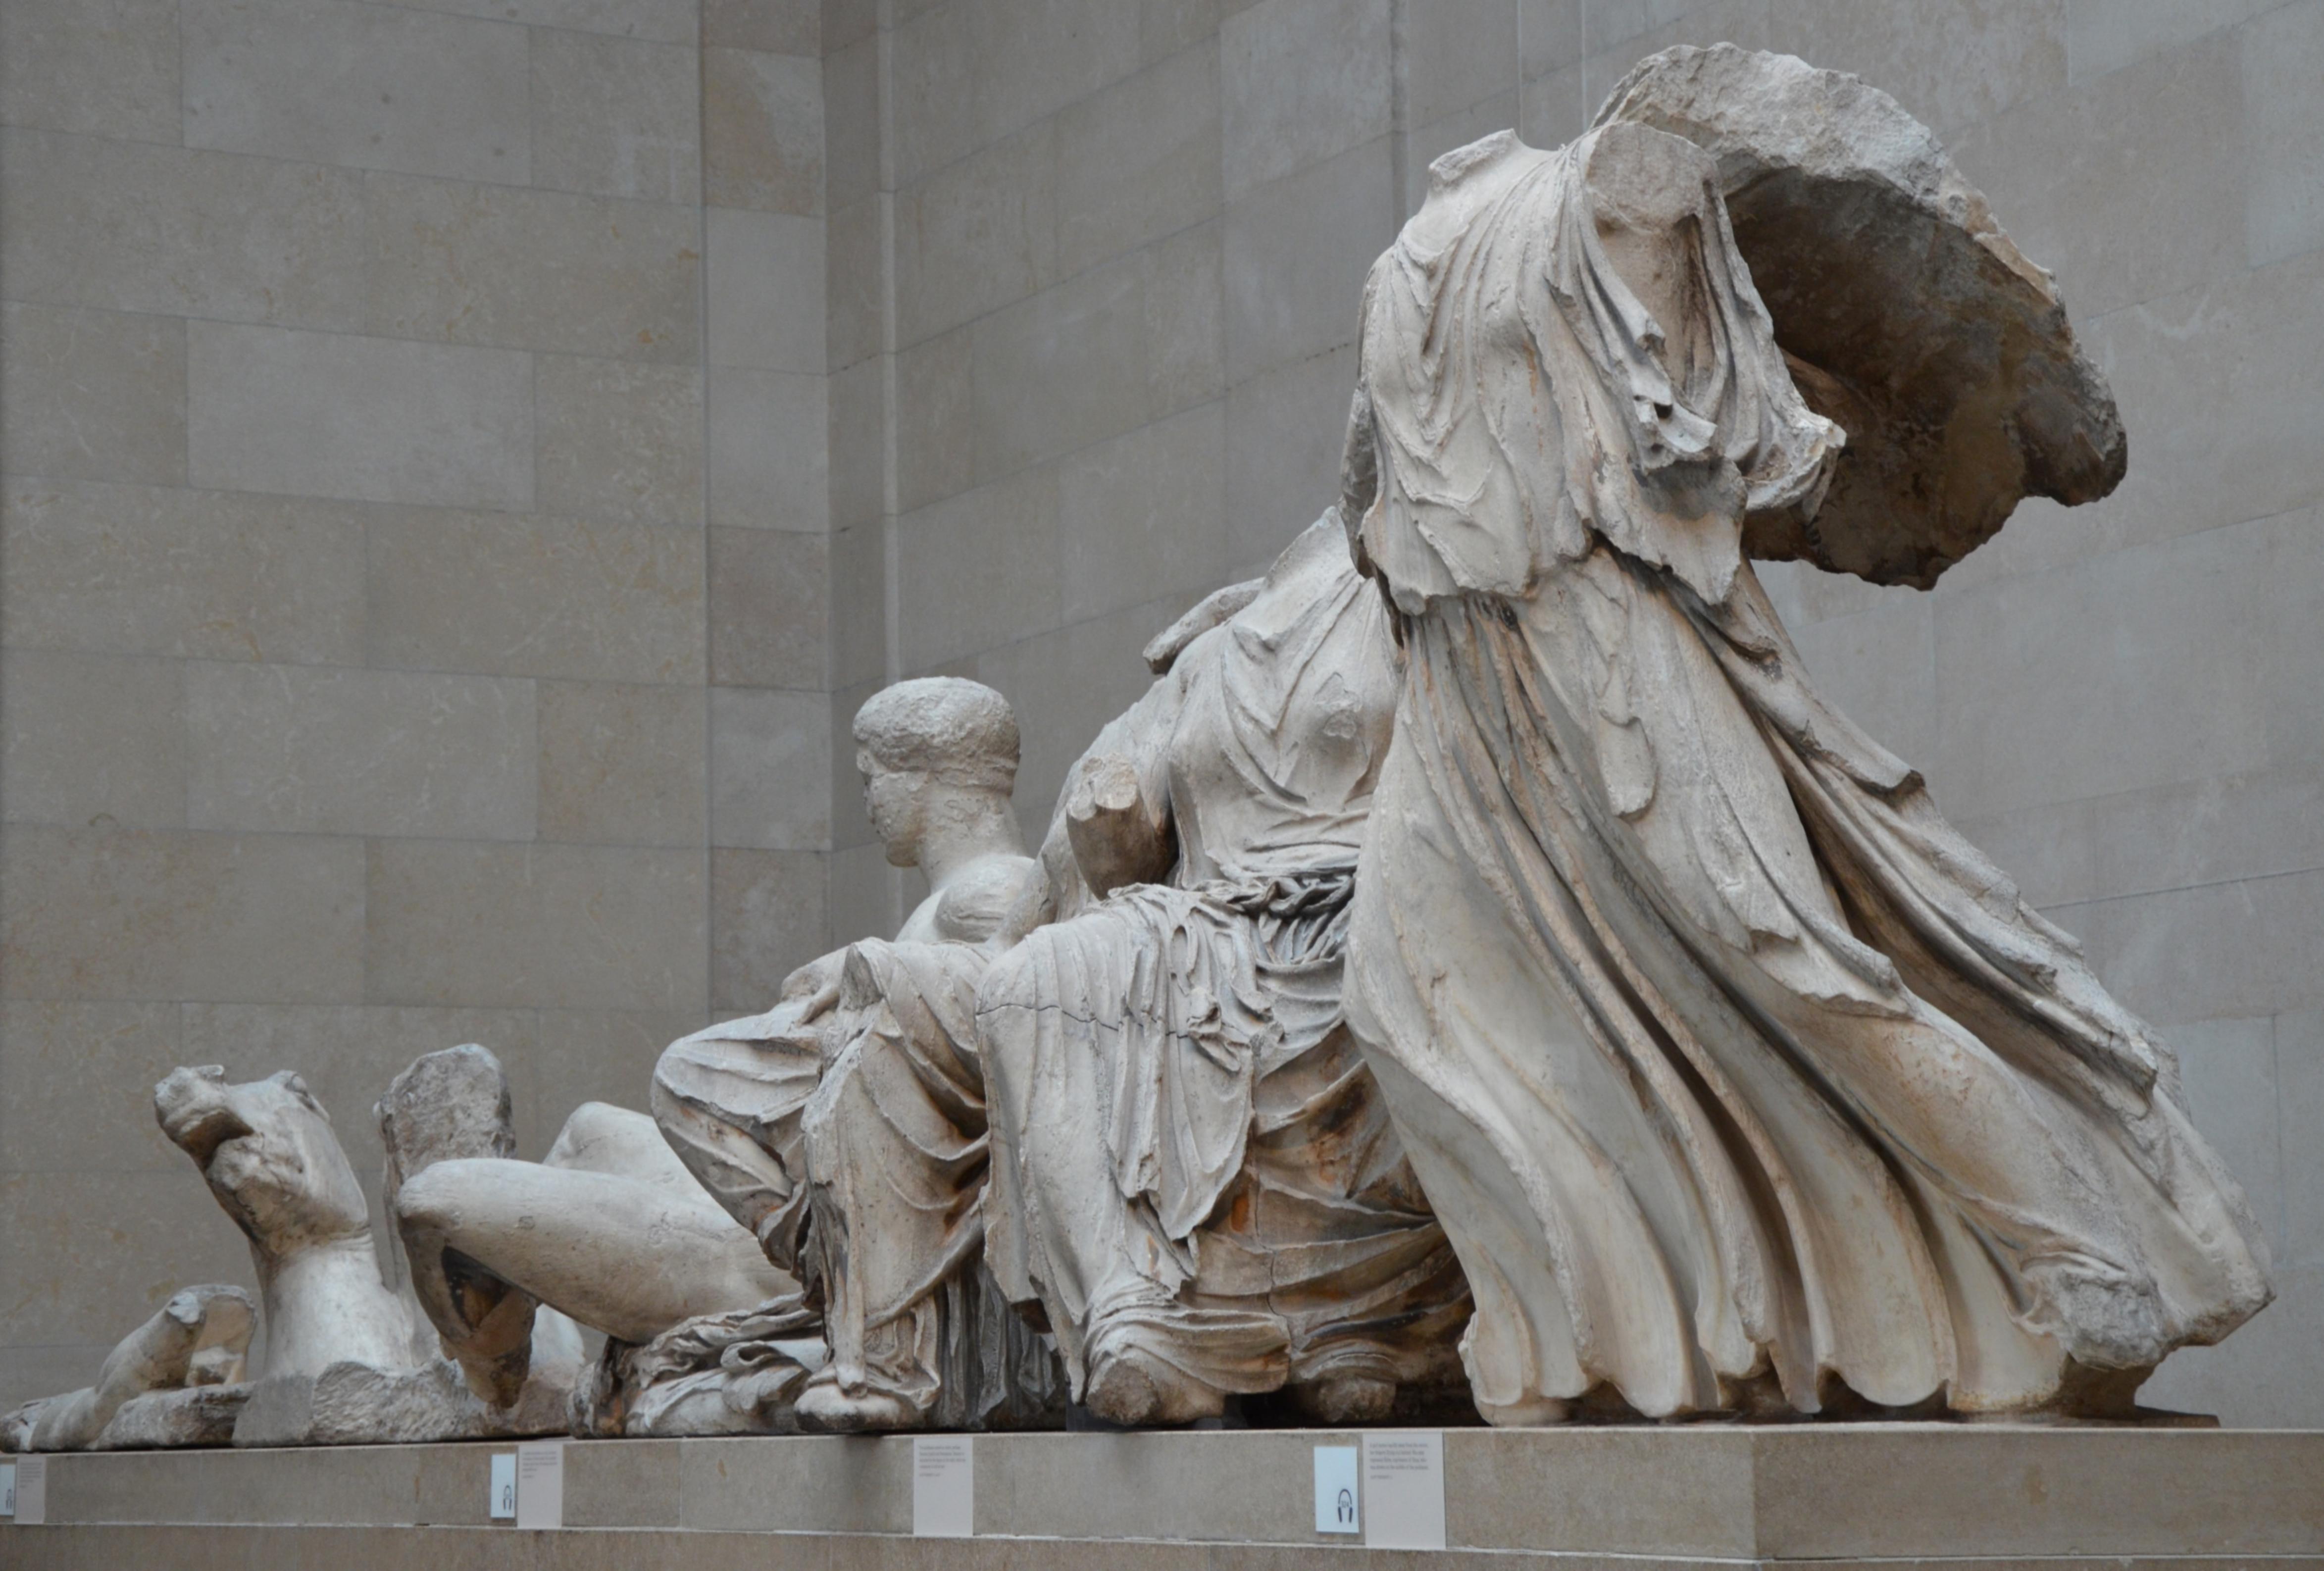 File The Parthenon Sculptures An Oblique View Of The